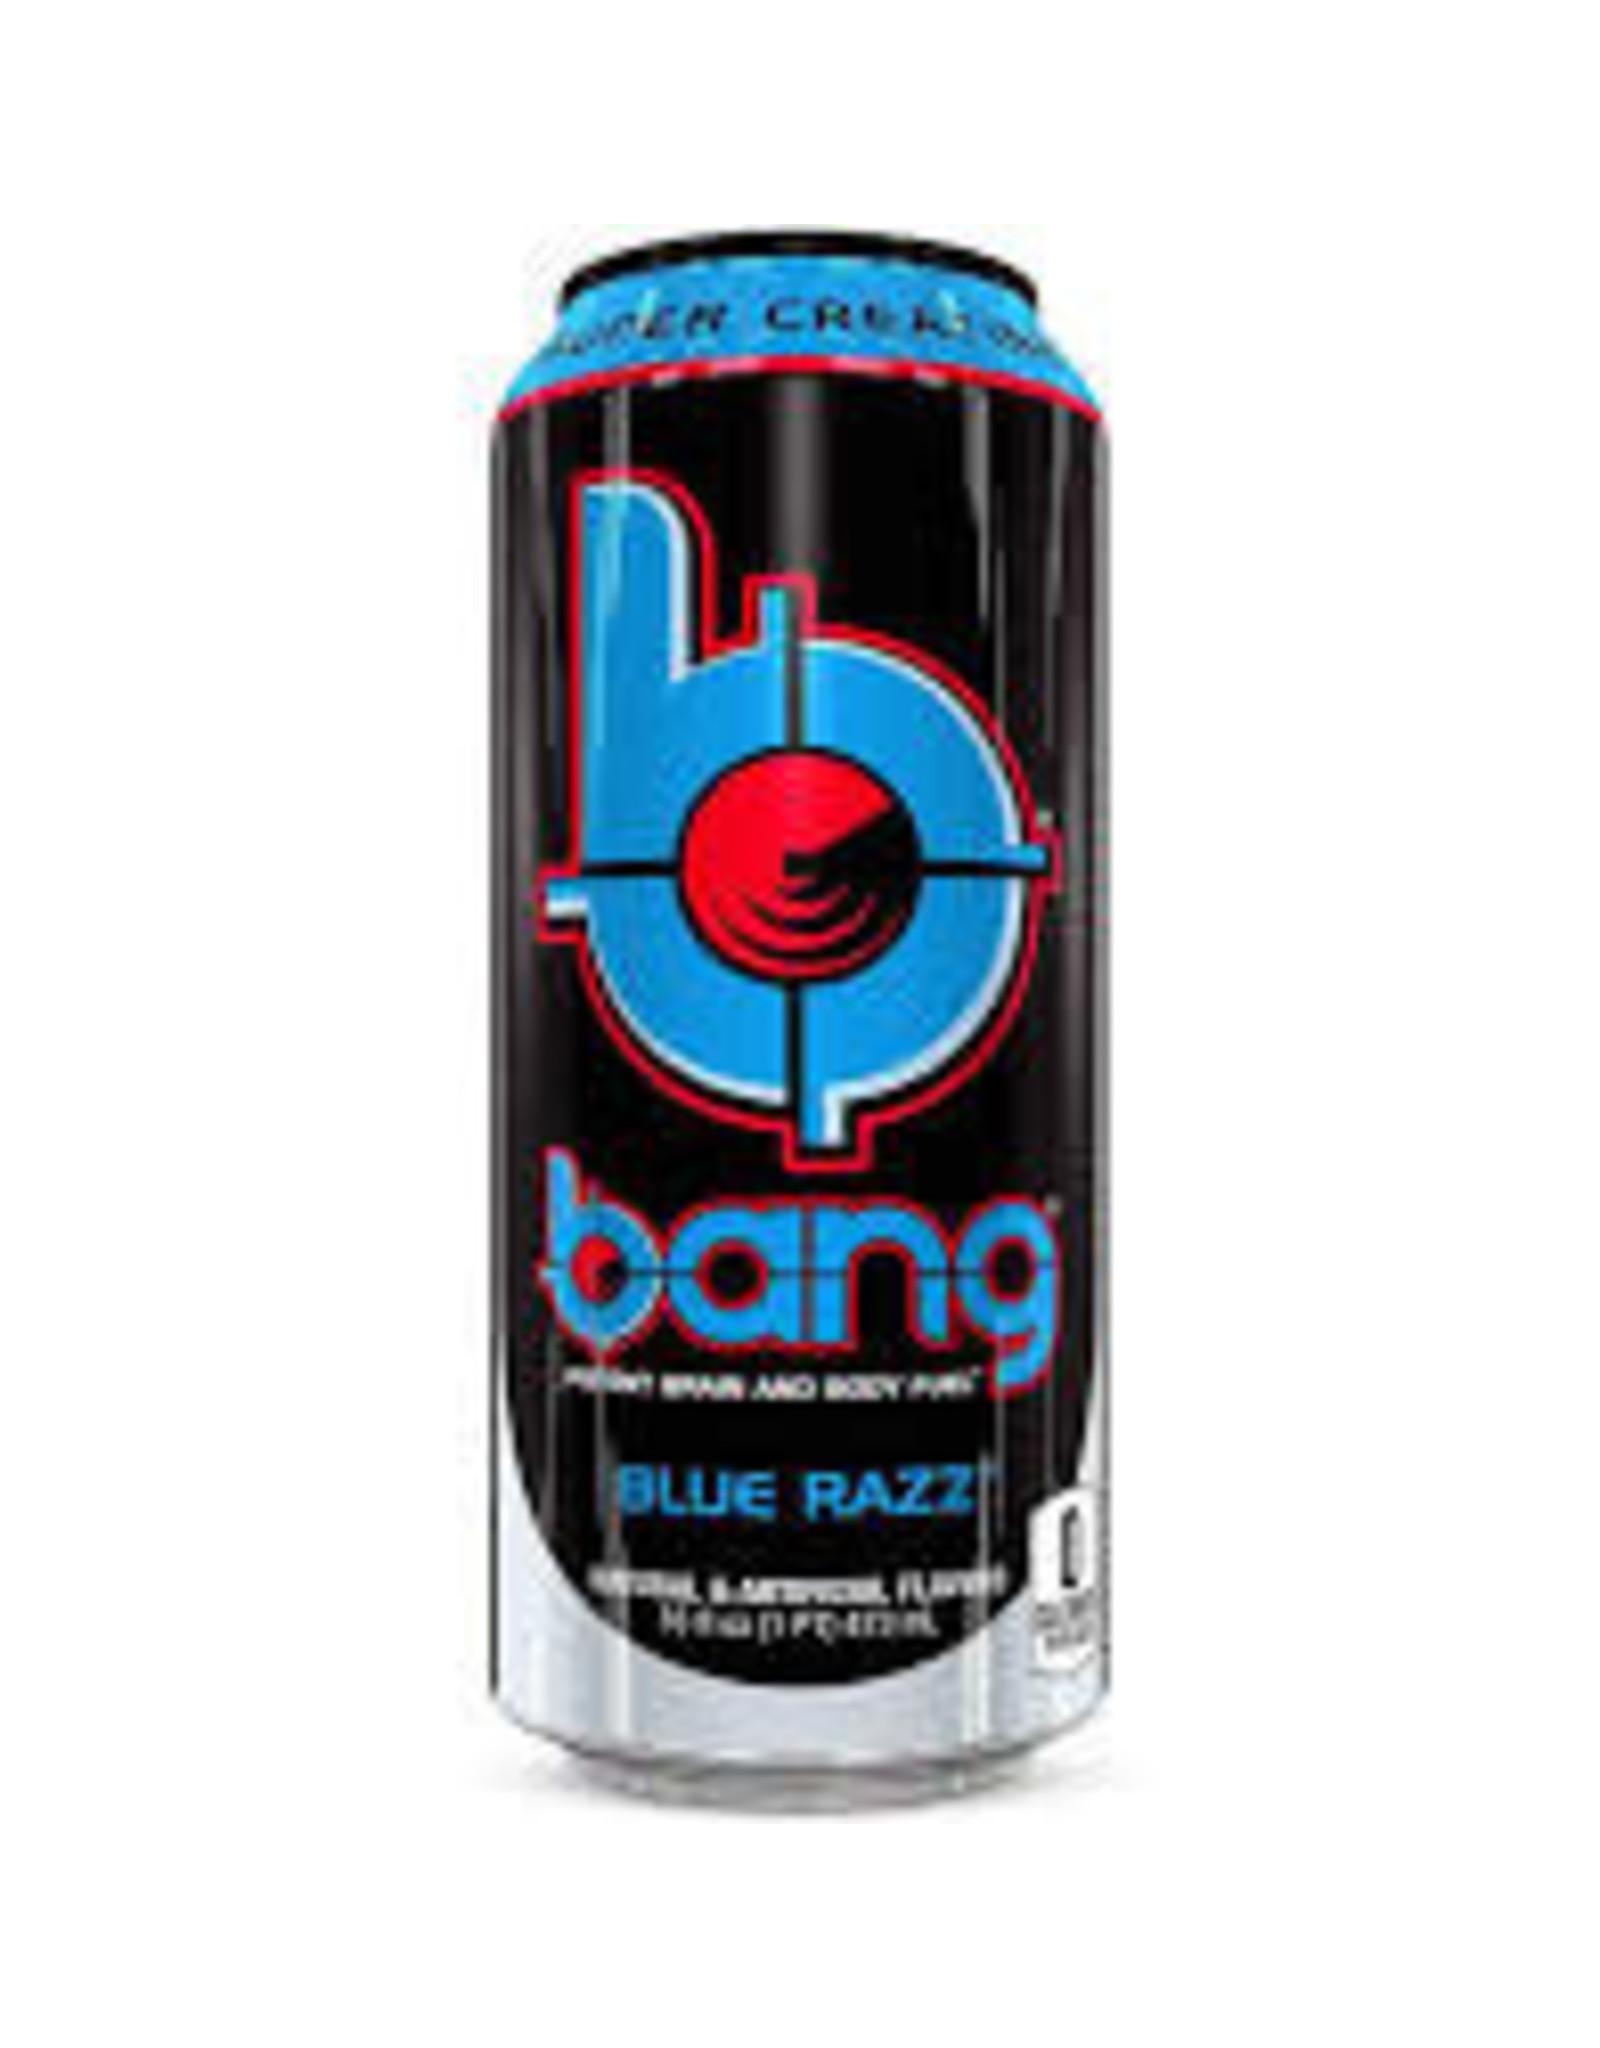 BANG STAR BLAST 16OZ CAN